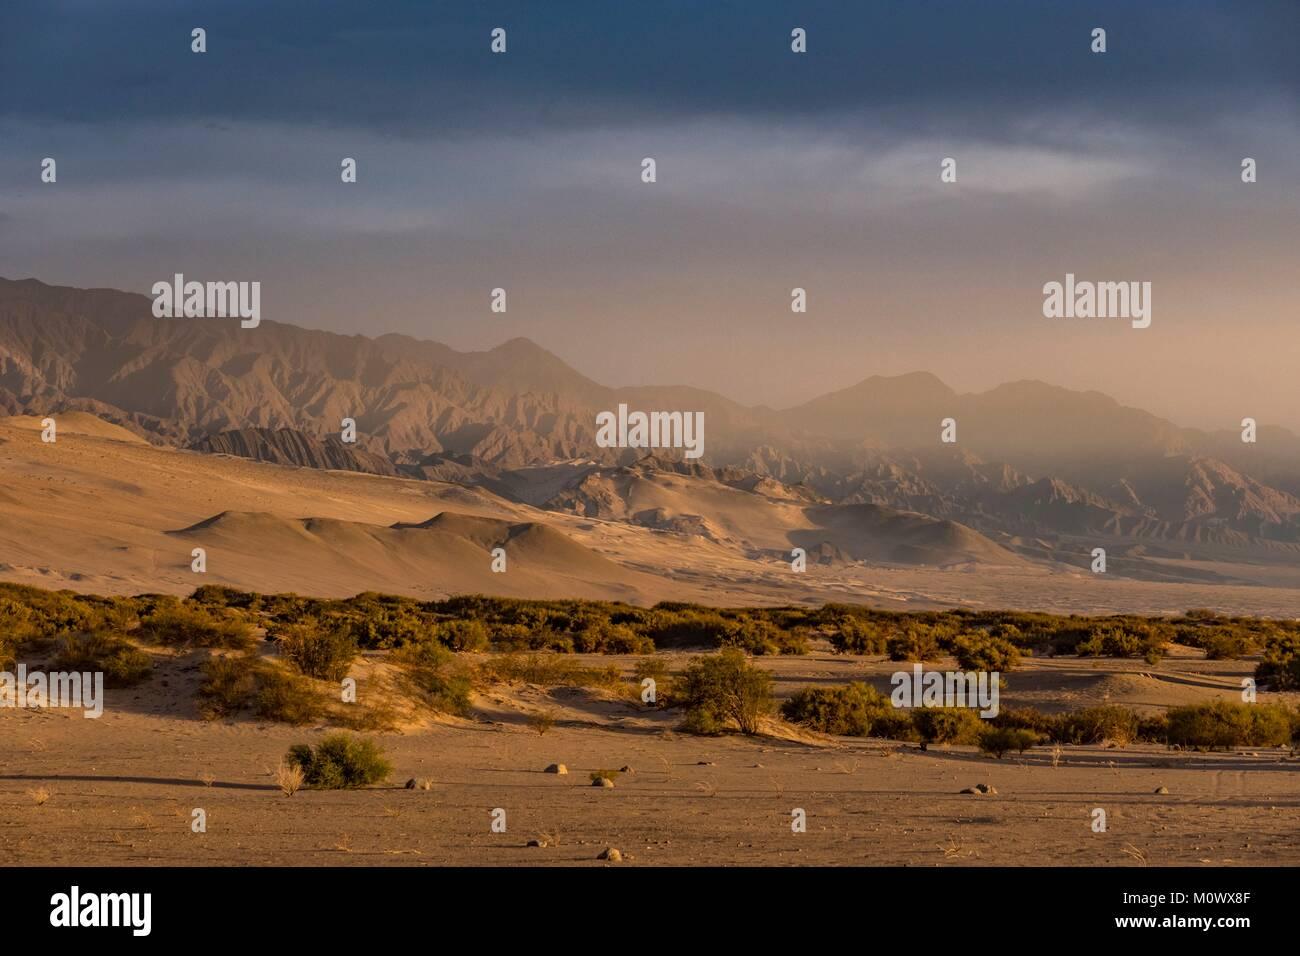 L'Argentina,Catamarca provincia,Taton dunes,intorno a Fiambala Immagini Stock